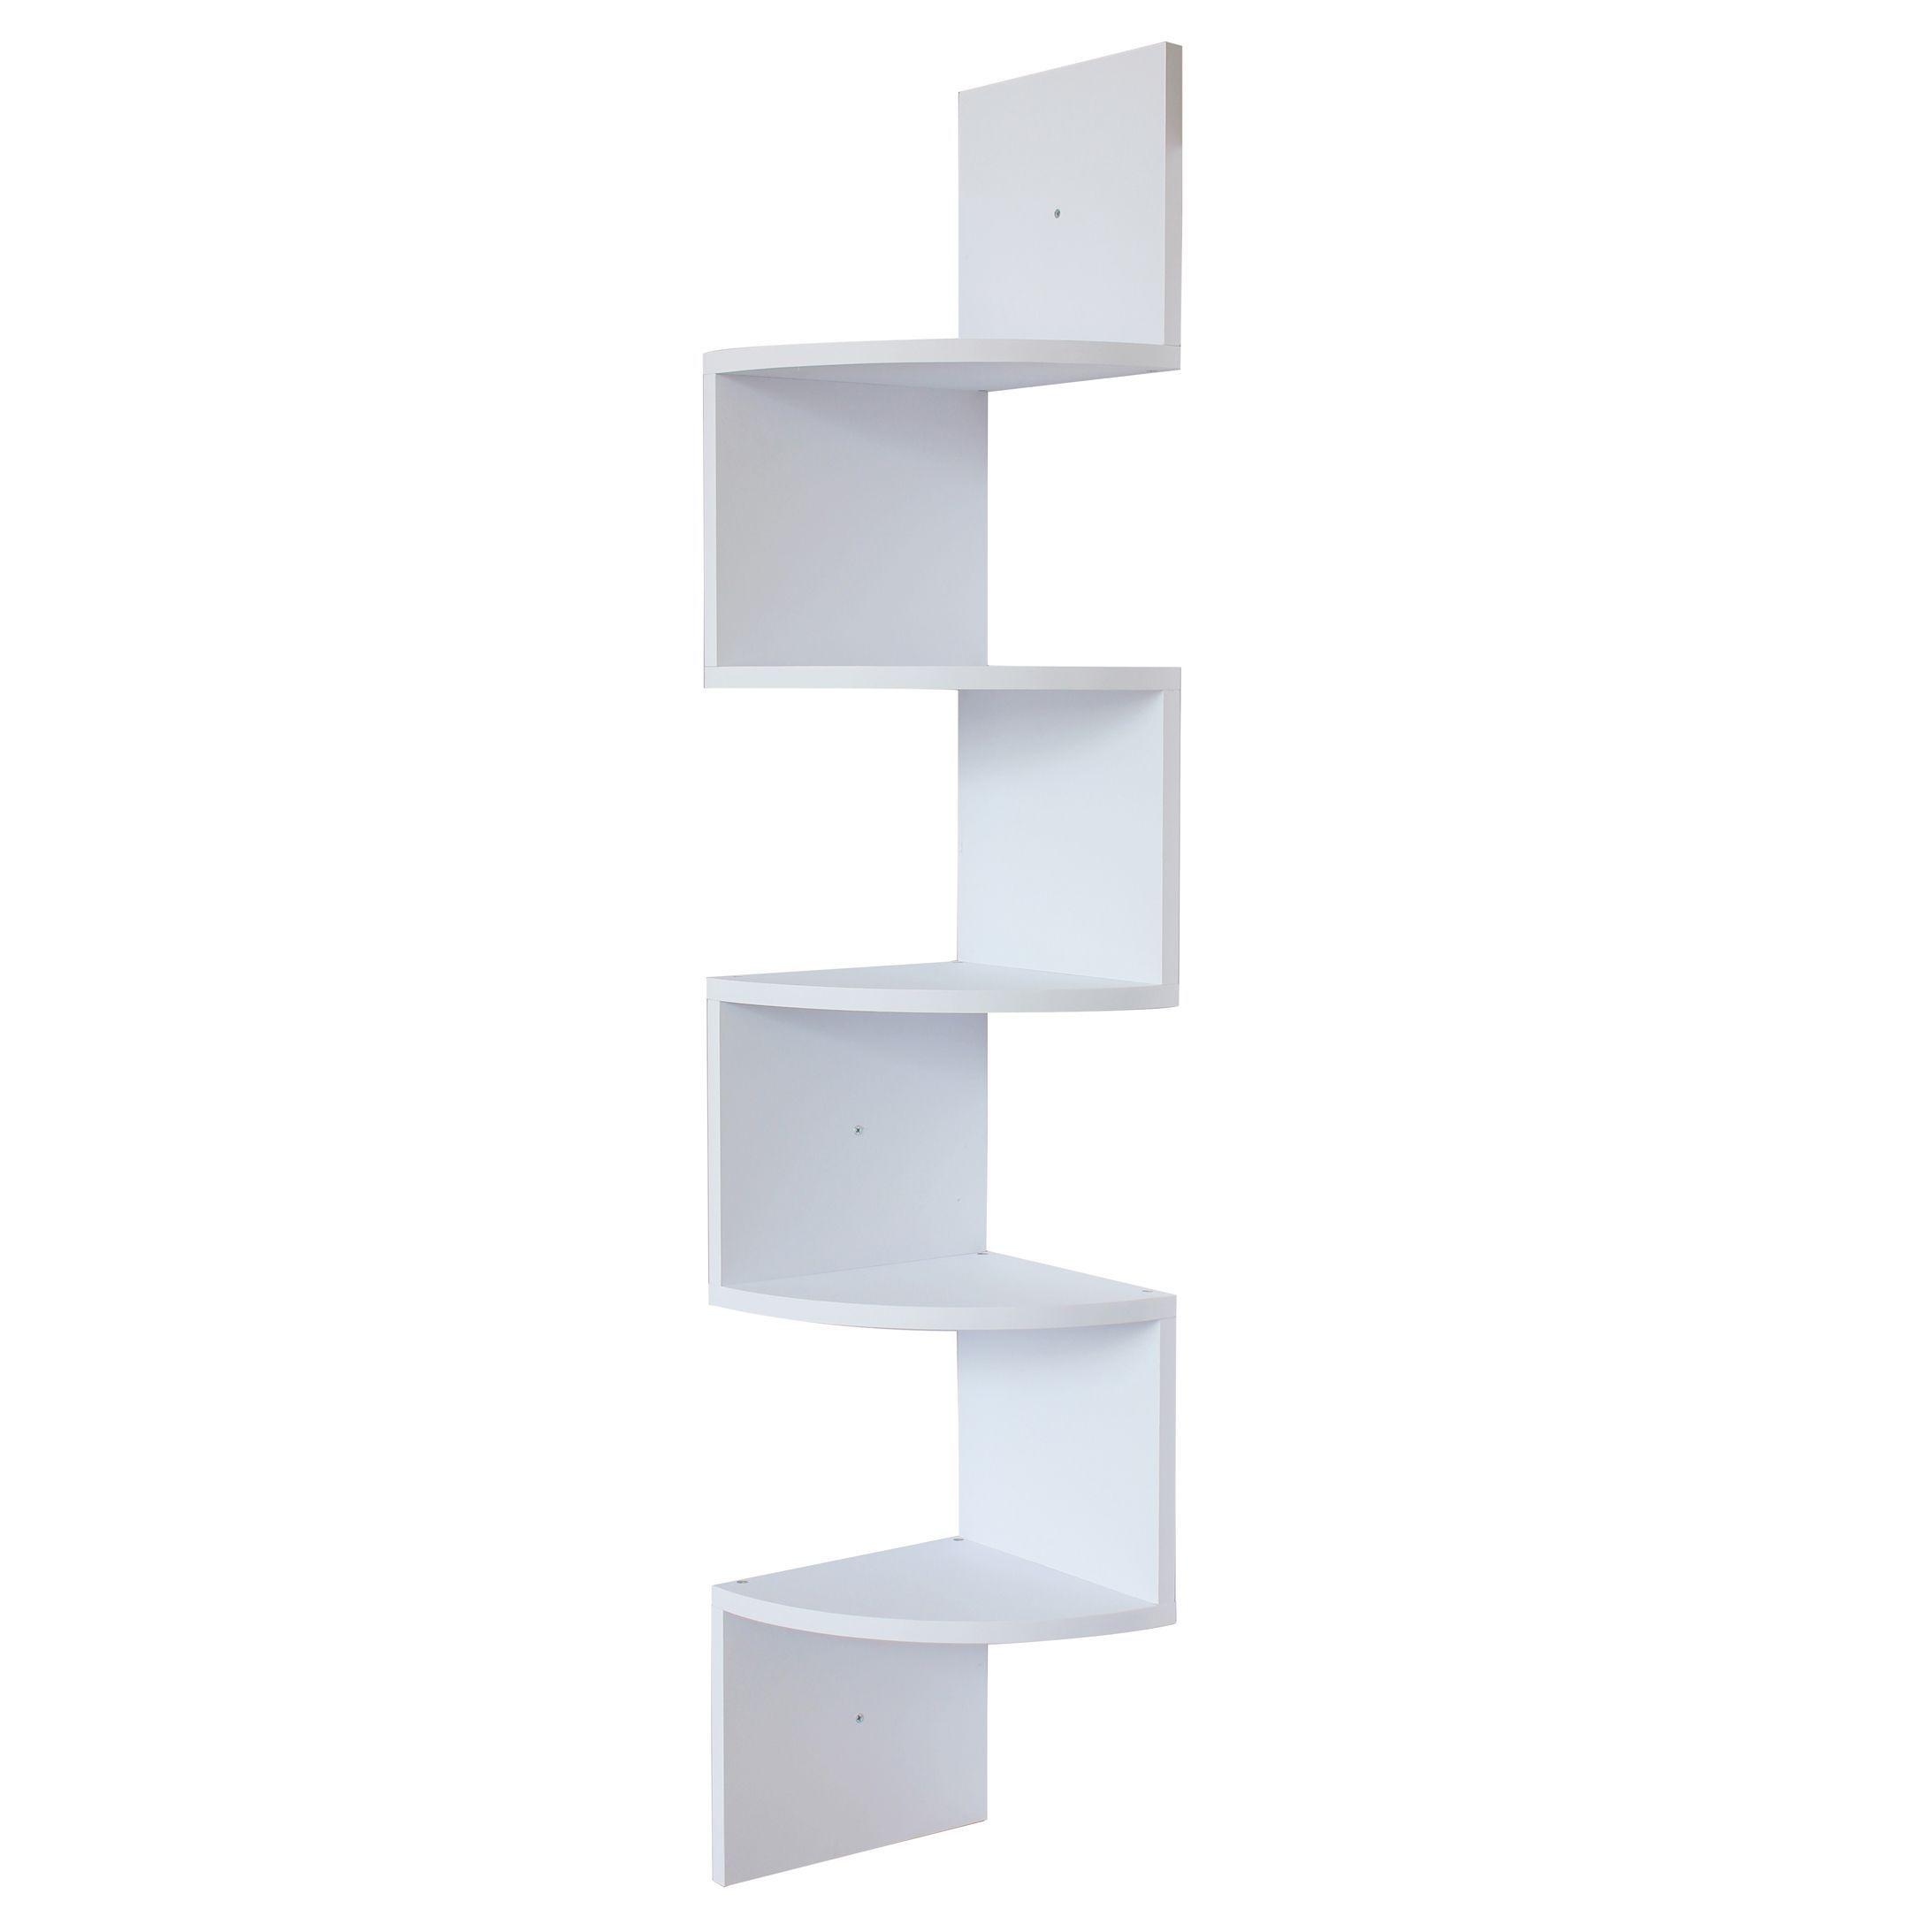 White Finish Large Corner Wall Mount Zig Zag Wallmount Shelf Hanging Shelf Decor White Wall Shelves Wall Mounted Shelves